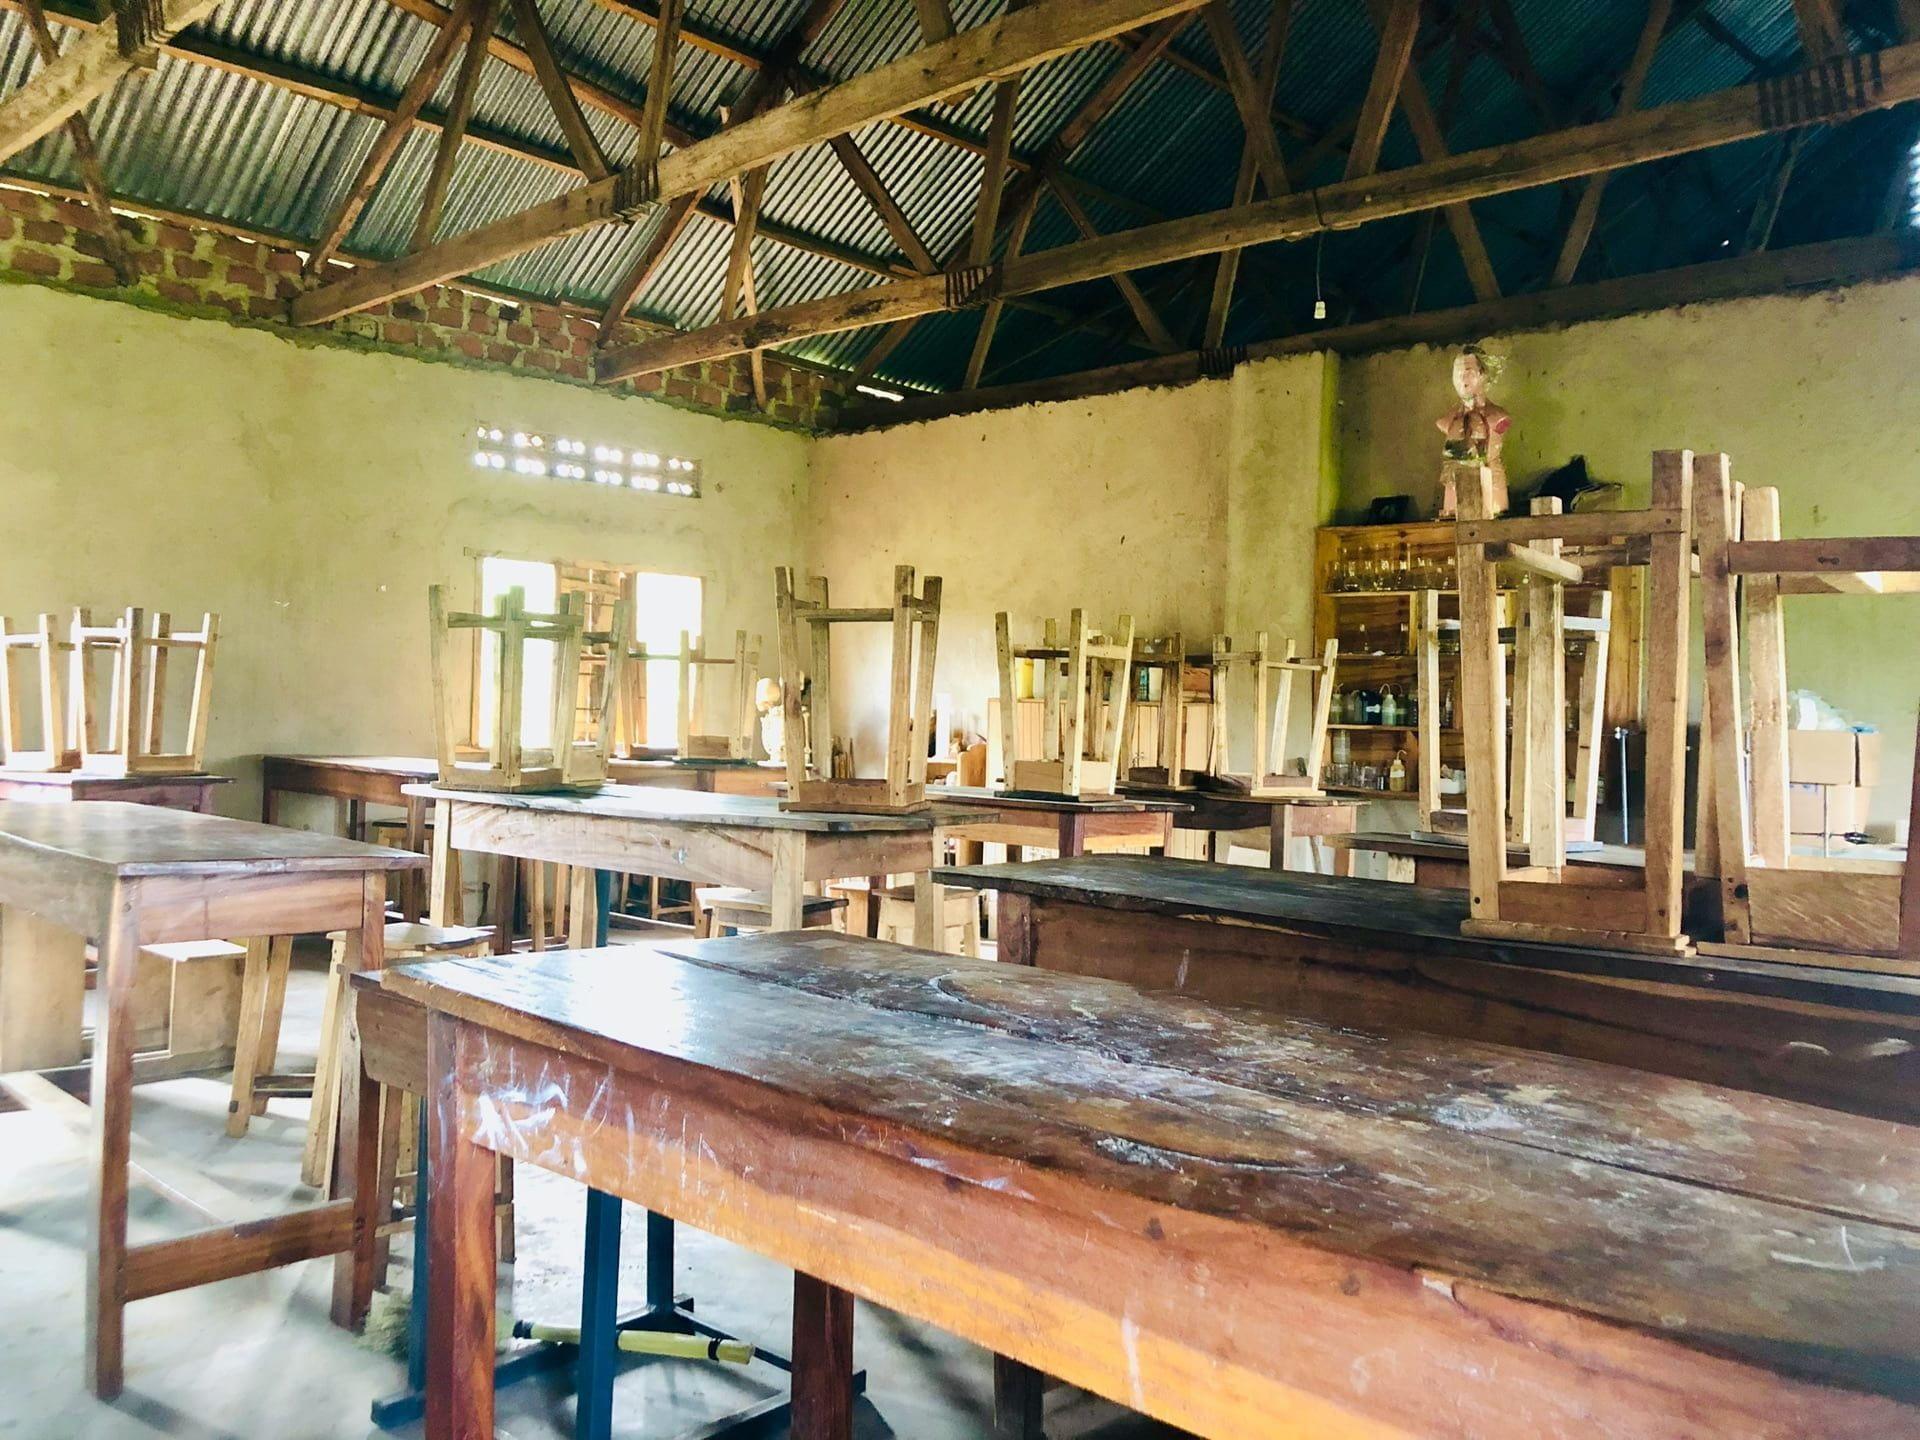 A classroom in Uganda